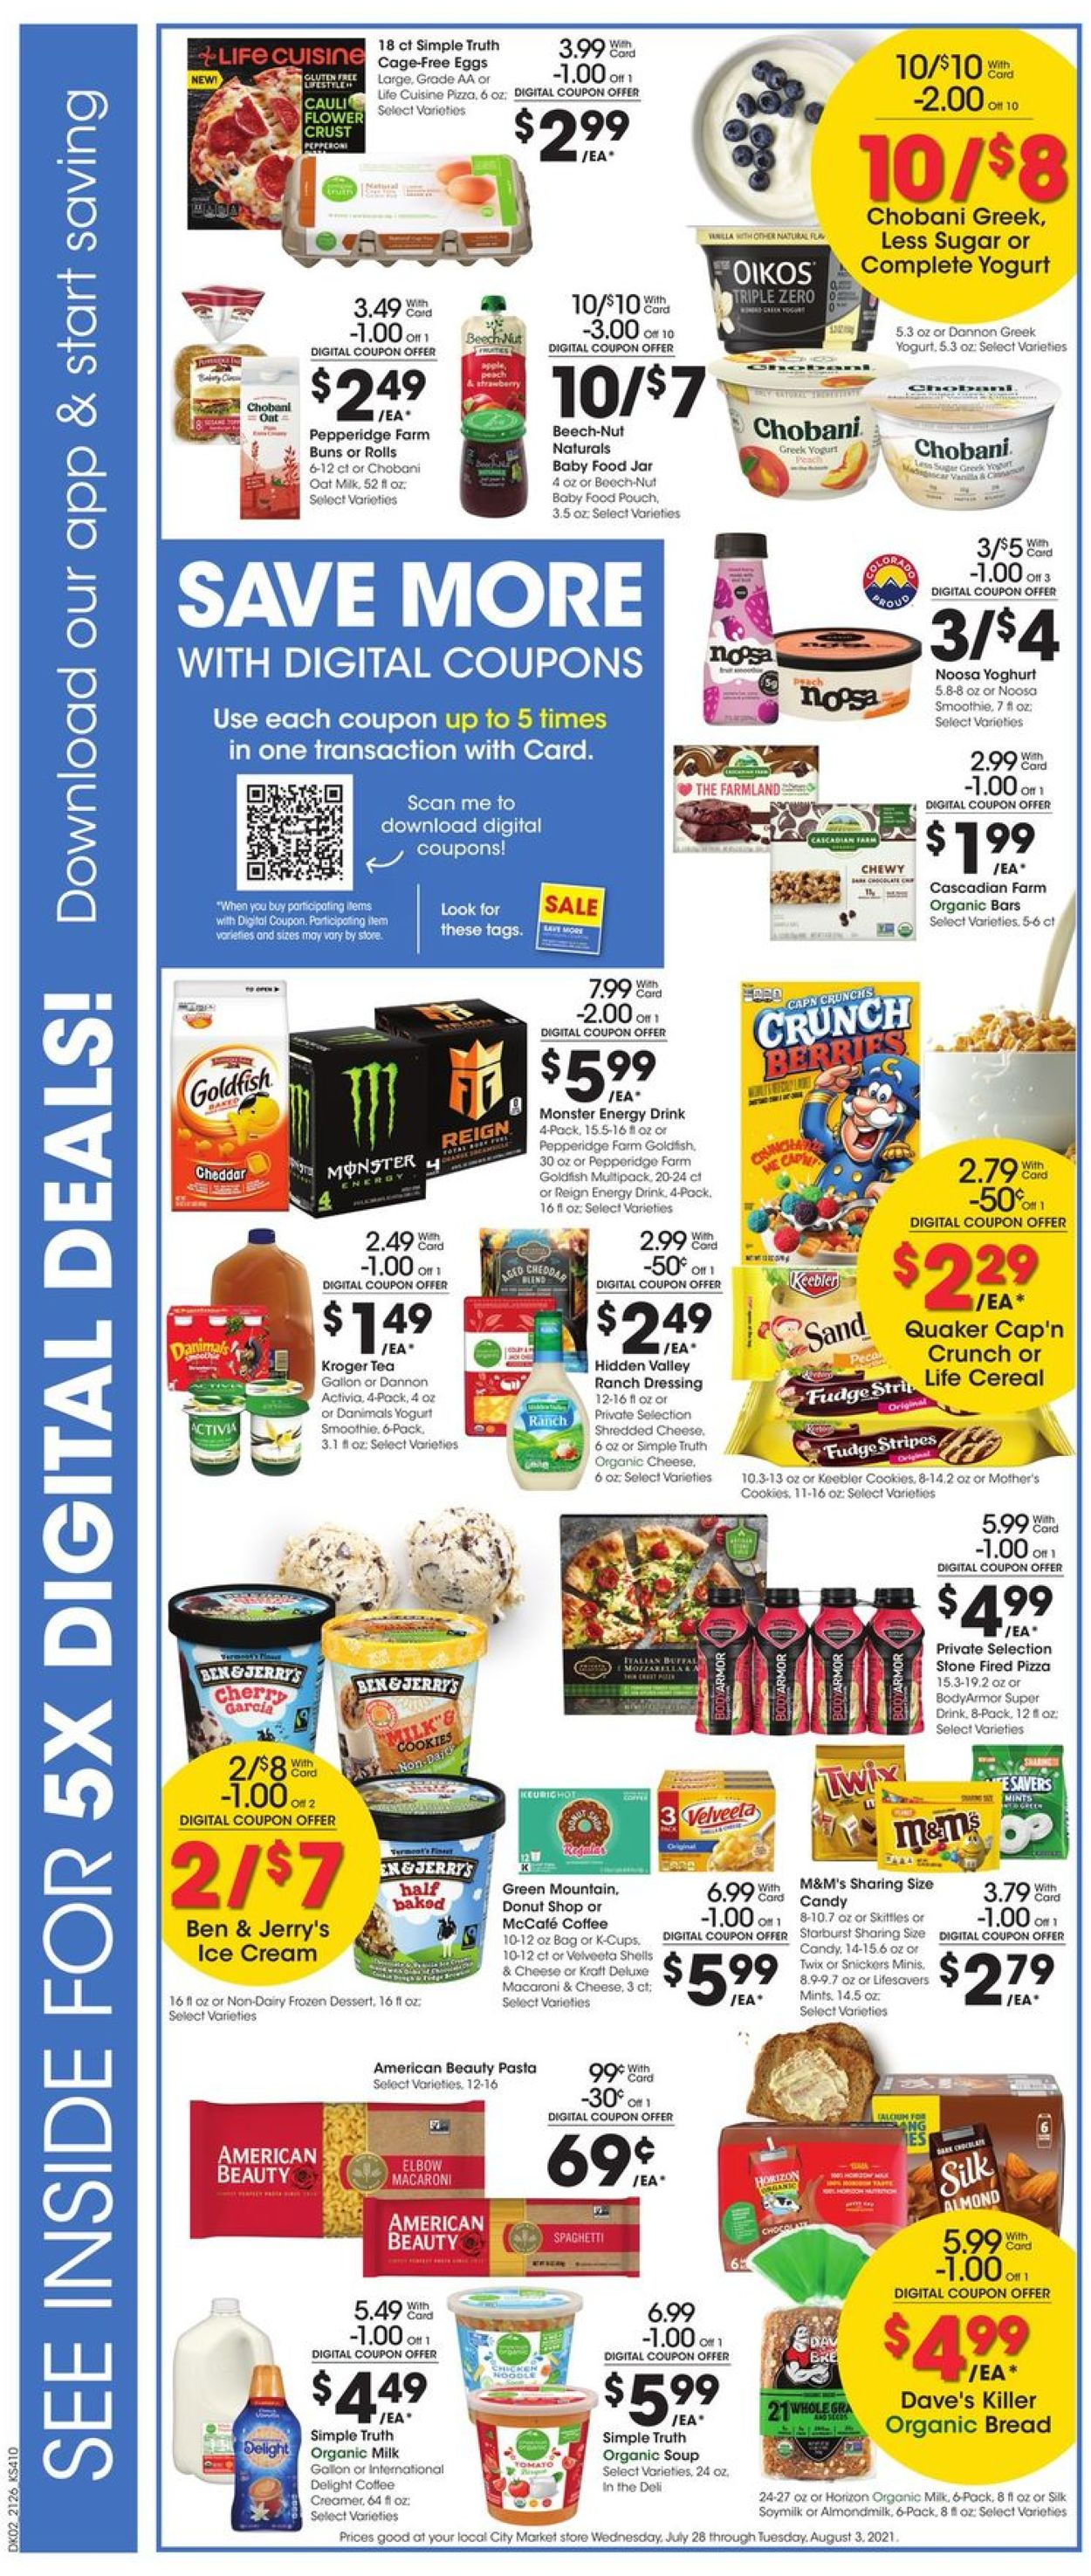 City Market Weekly Ad Circular - valid 07/28-08/03/2021 (Page 5)